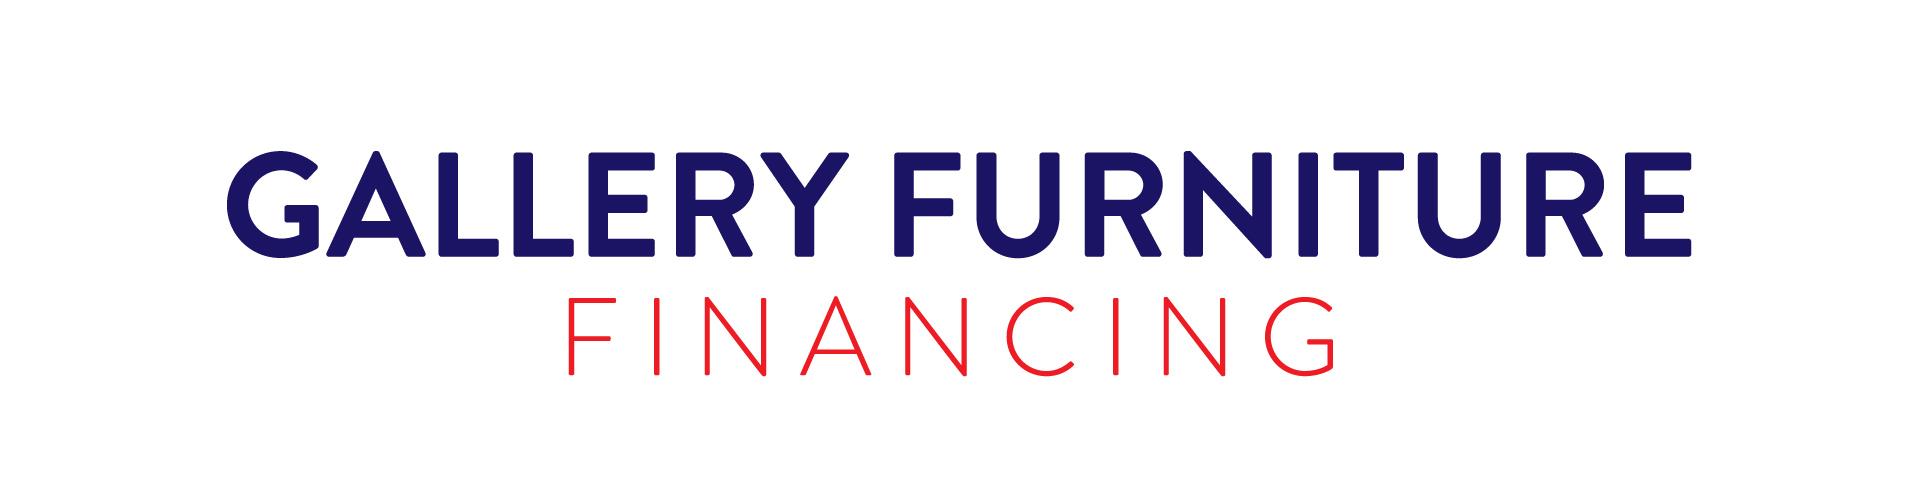 GF Financing Offers